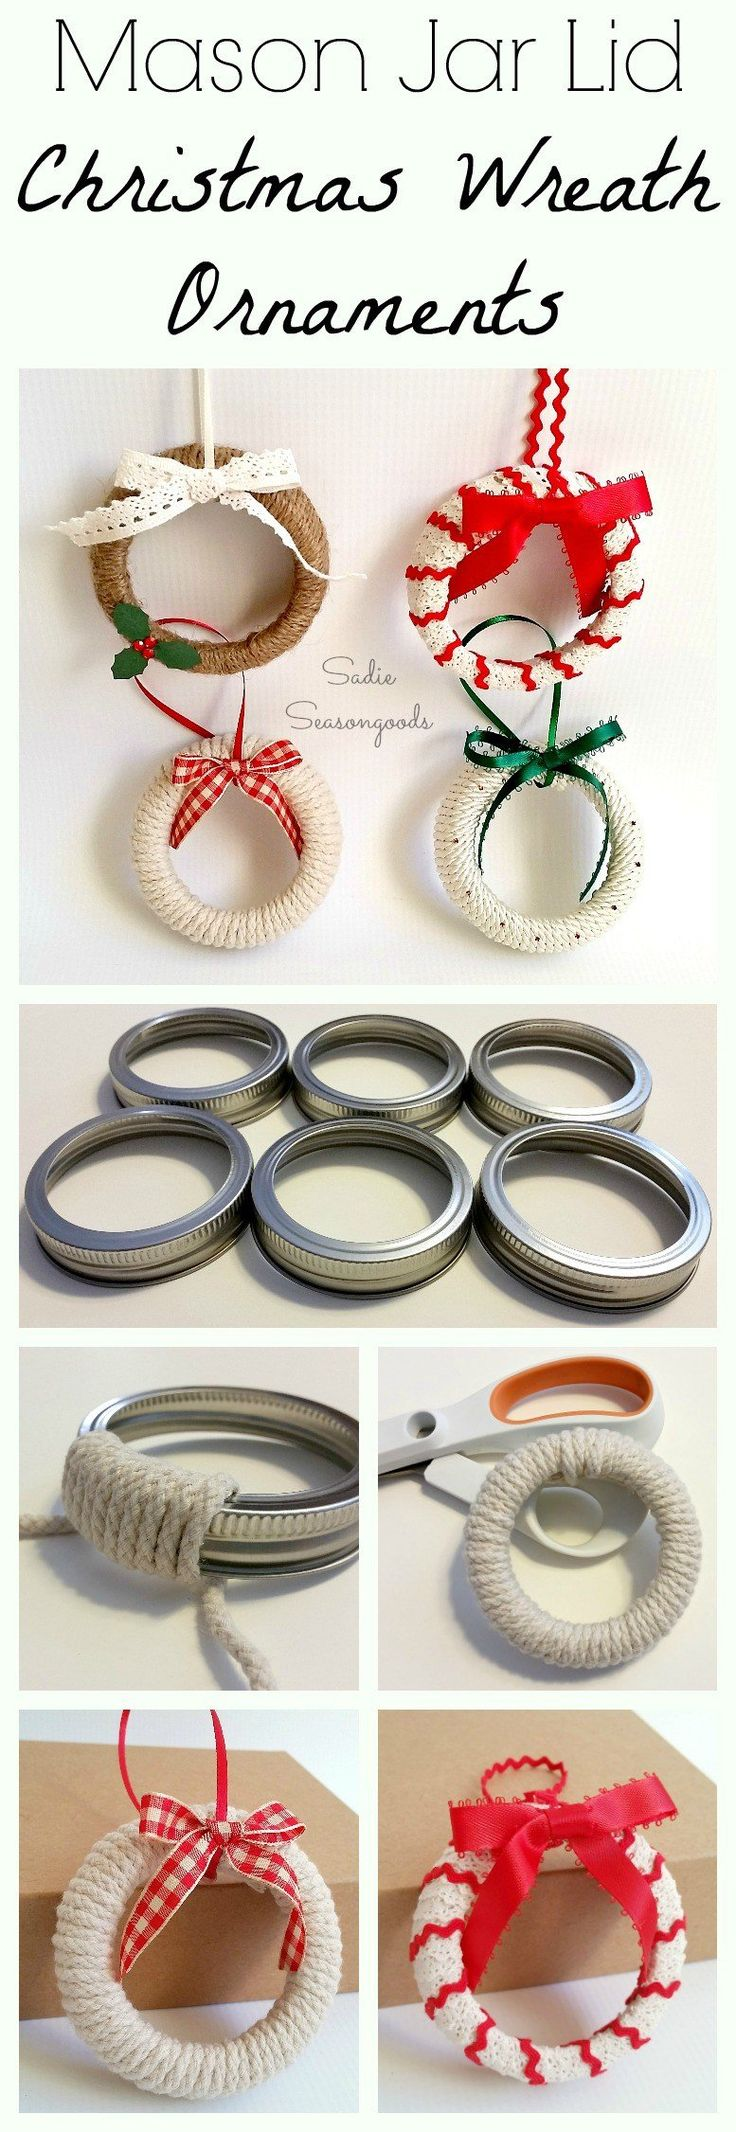 Mason Jar Lid Wreath Ornaments | 11 Easy Last Minute DIY Christmas Crafts